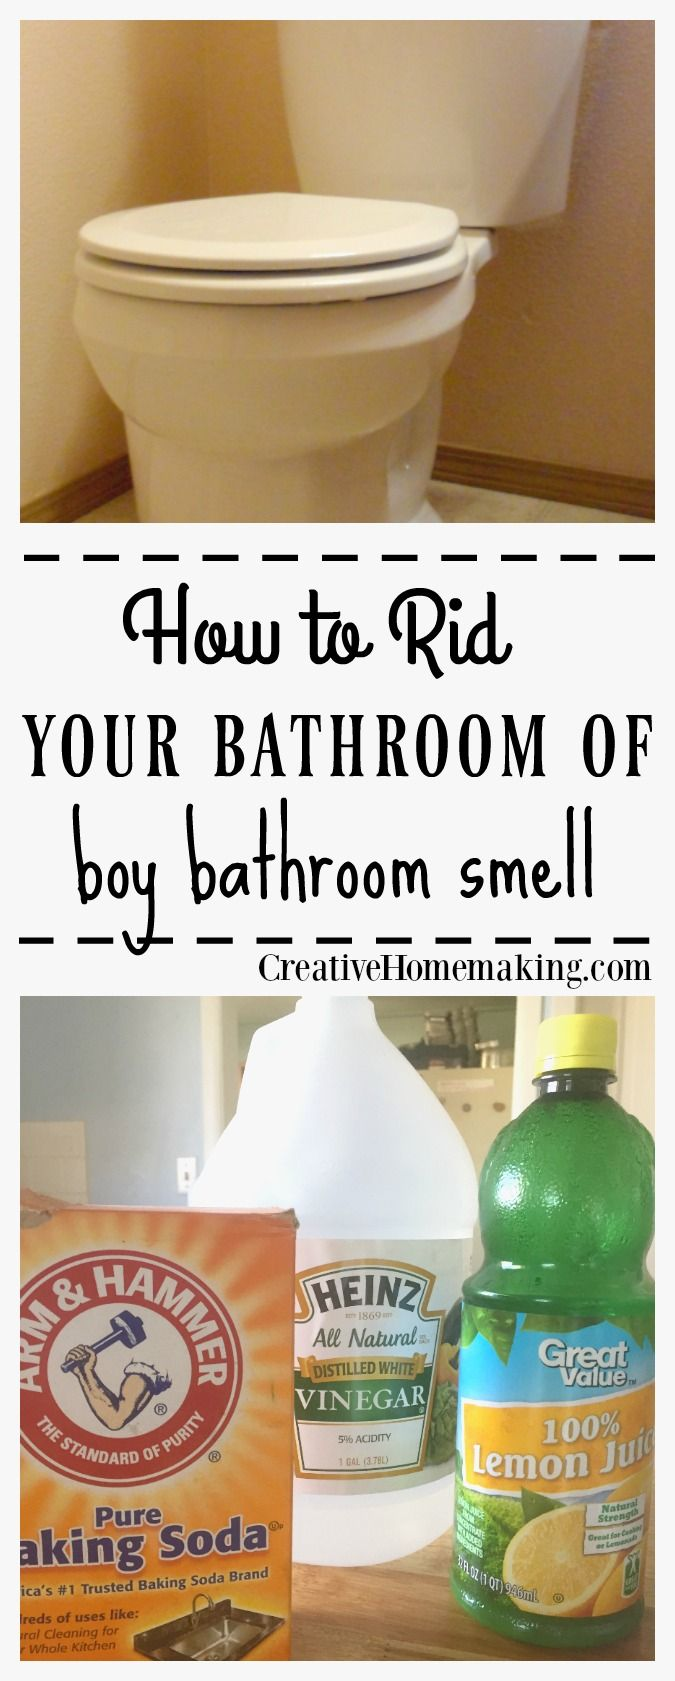 Easy DIY tip for ridding your bathroom of the dreaded 'boy bathroom smell'.